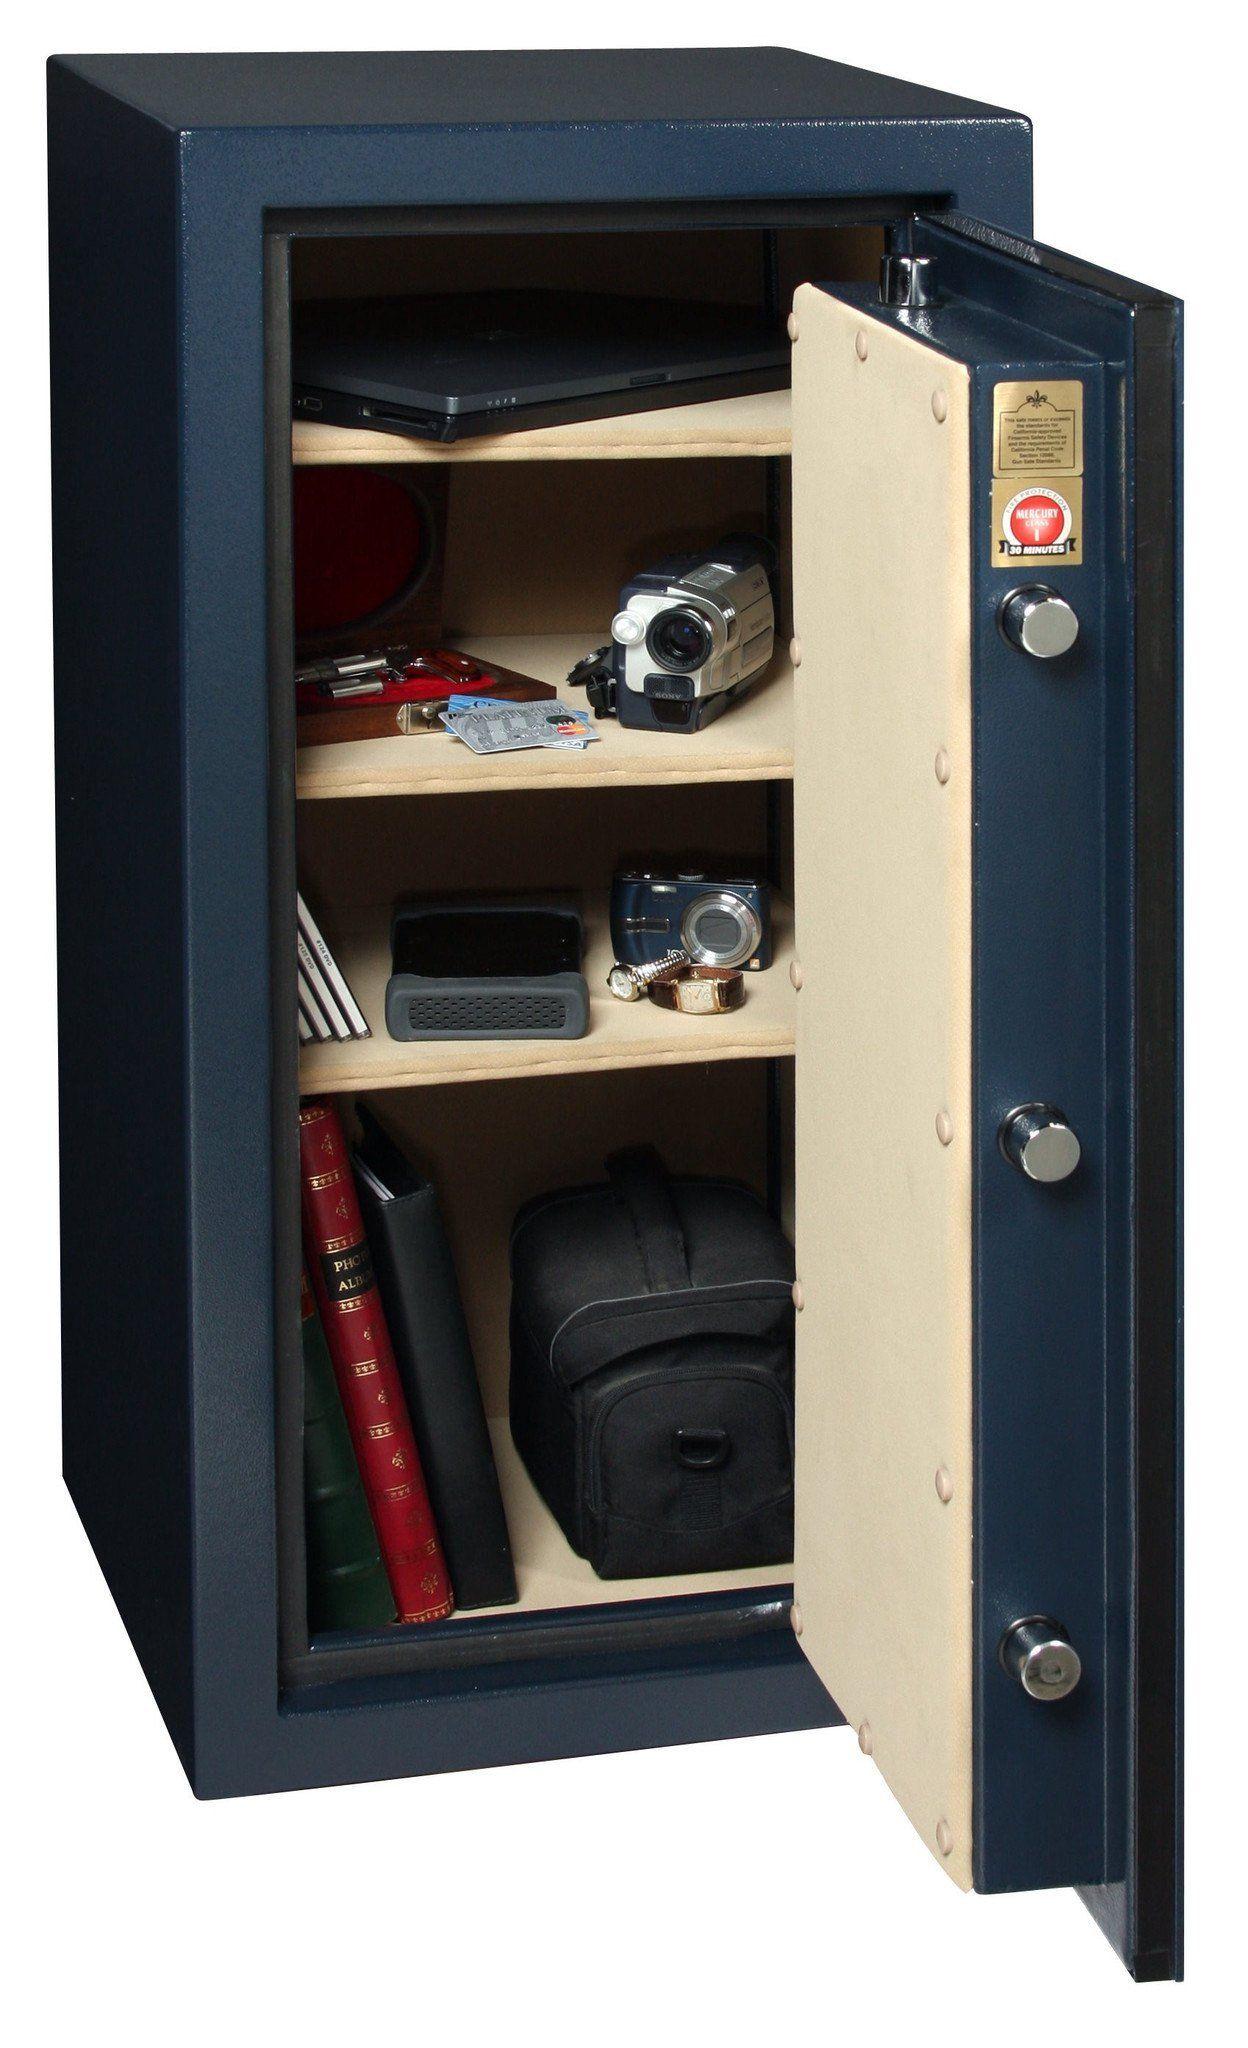 Amsec Am4020e5 Home Security Safe Wall Safe Security Safe Home Safes